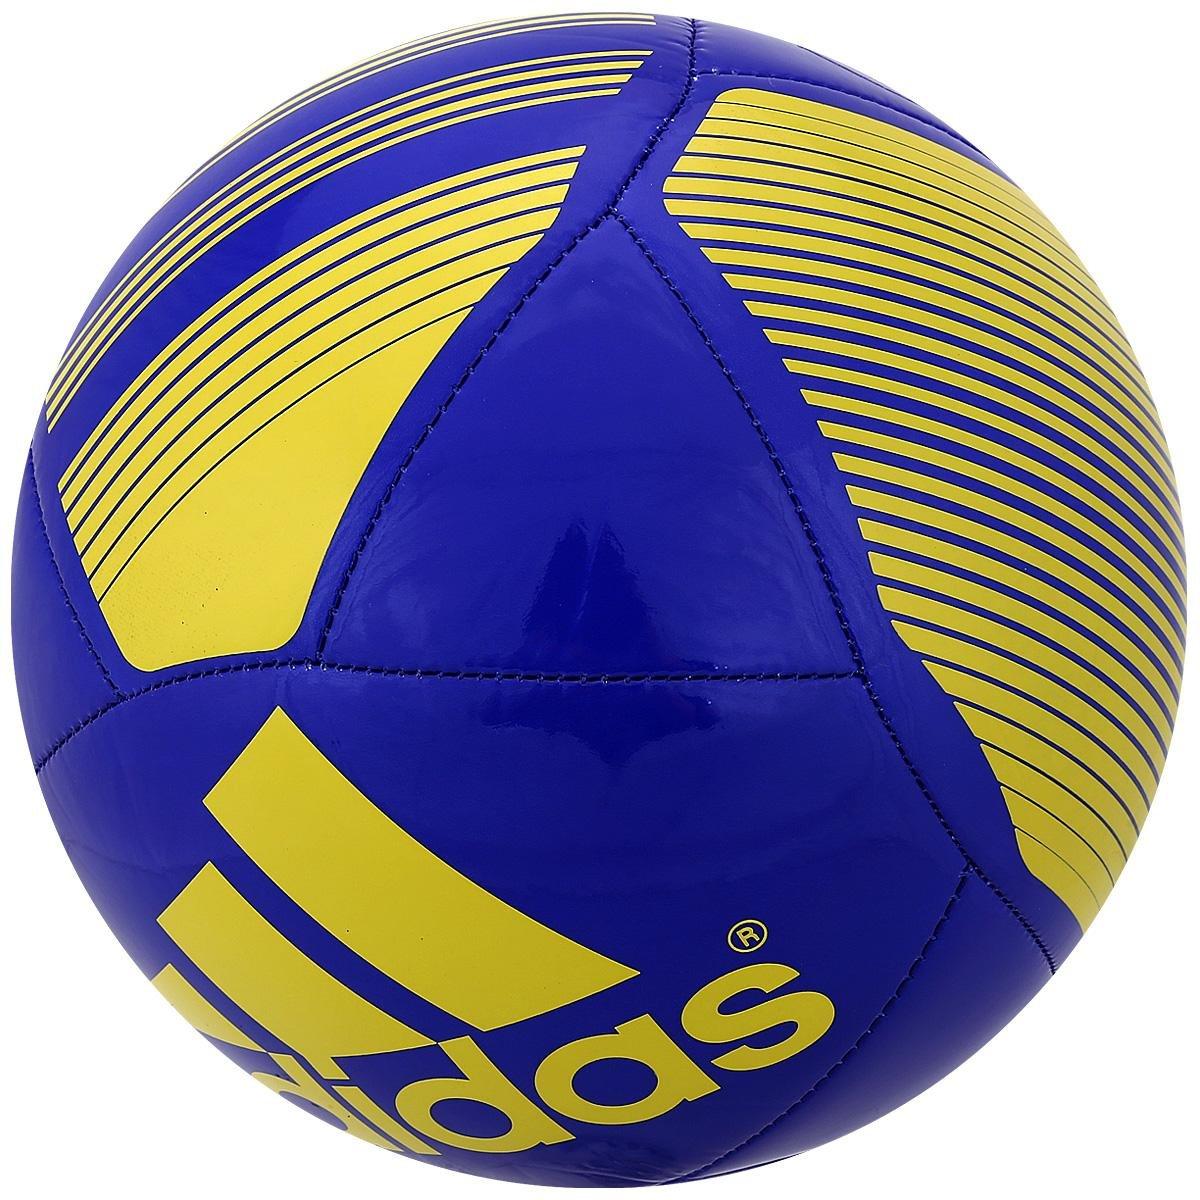 Bola Adidas EPP Glider Campo - Compre Agora  fd7ab8994bc2a